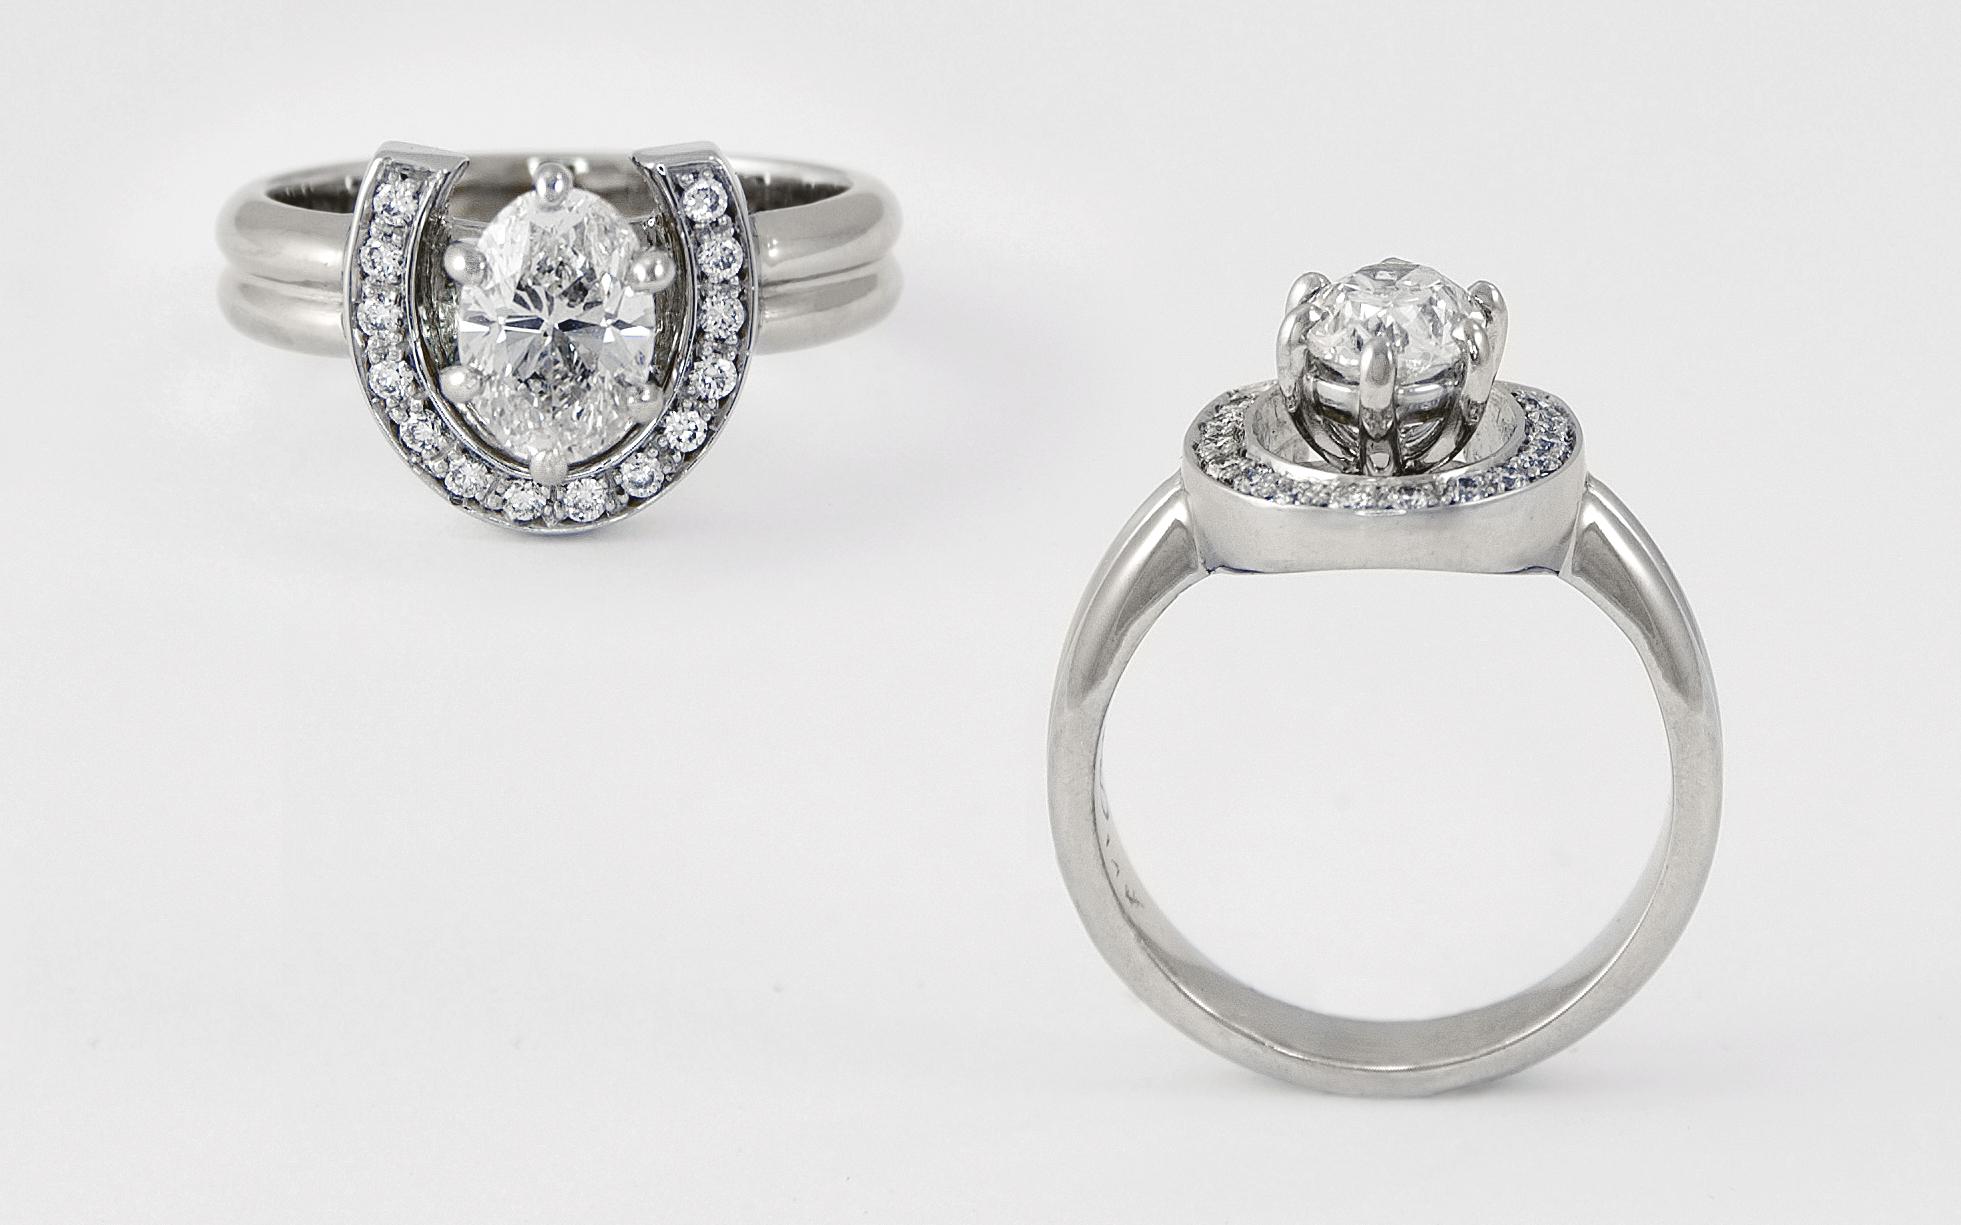 1 carat oval Diamond Horseshoe Ring